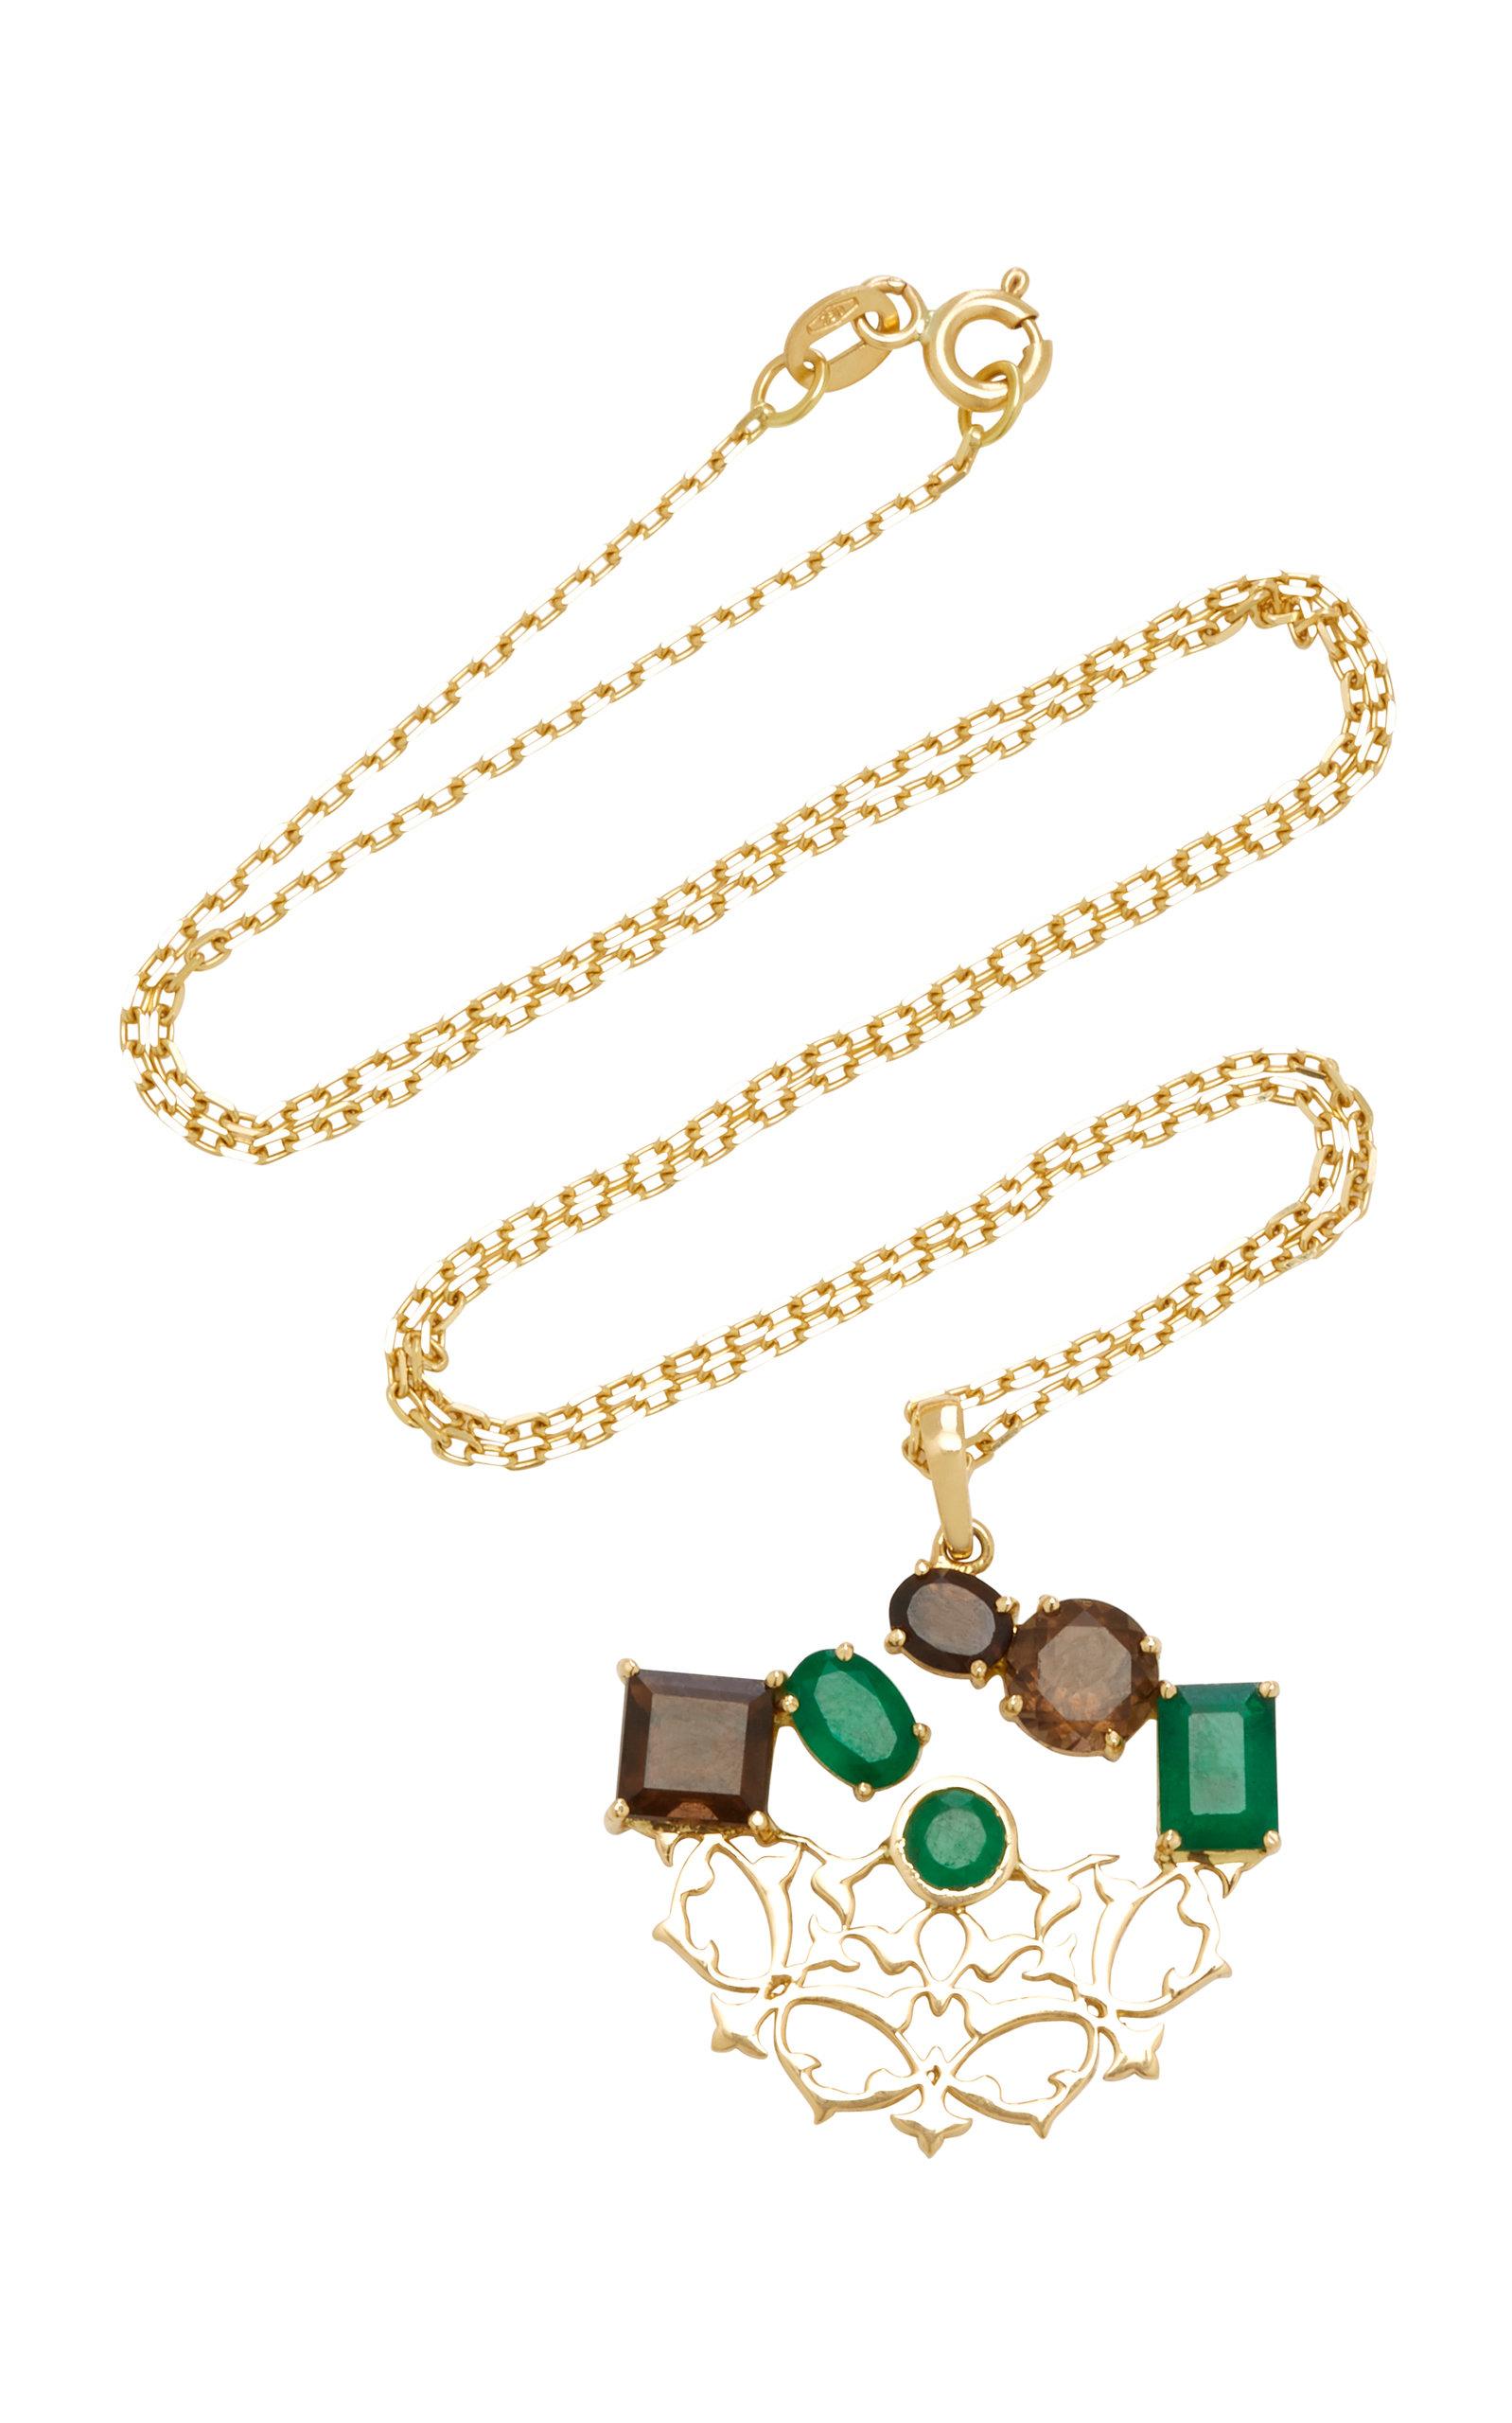 Women's Respect 18K Gold; Quartz and Emerald Necklace